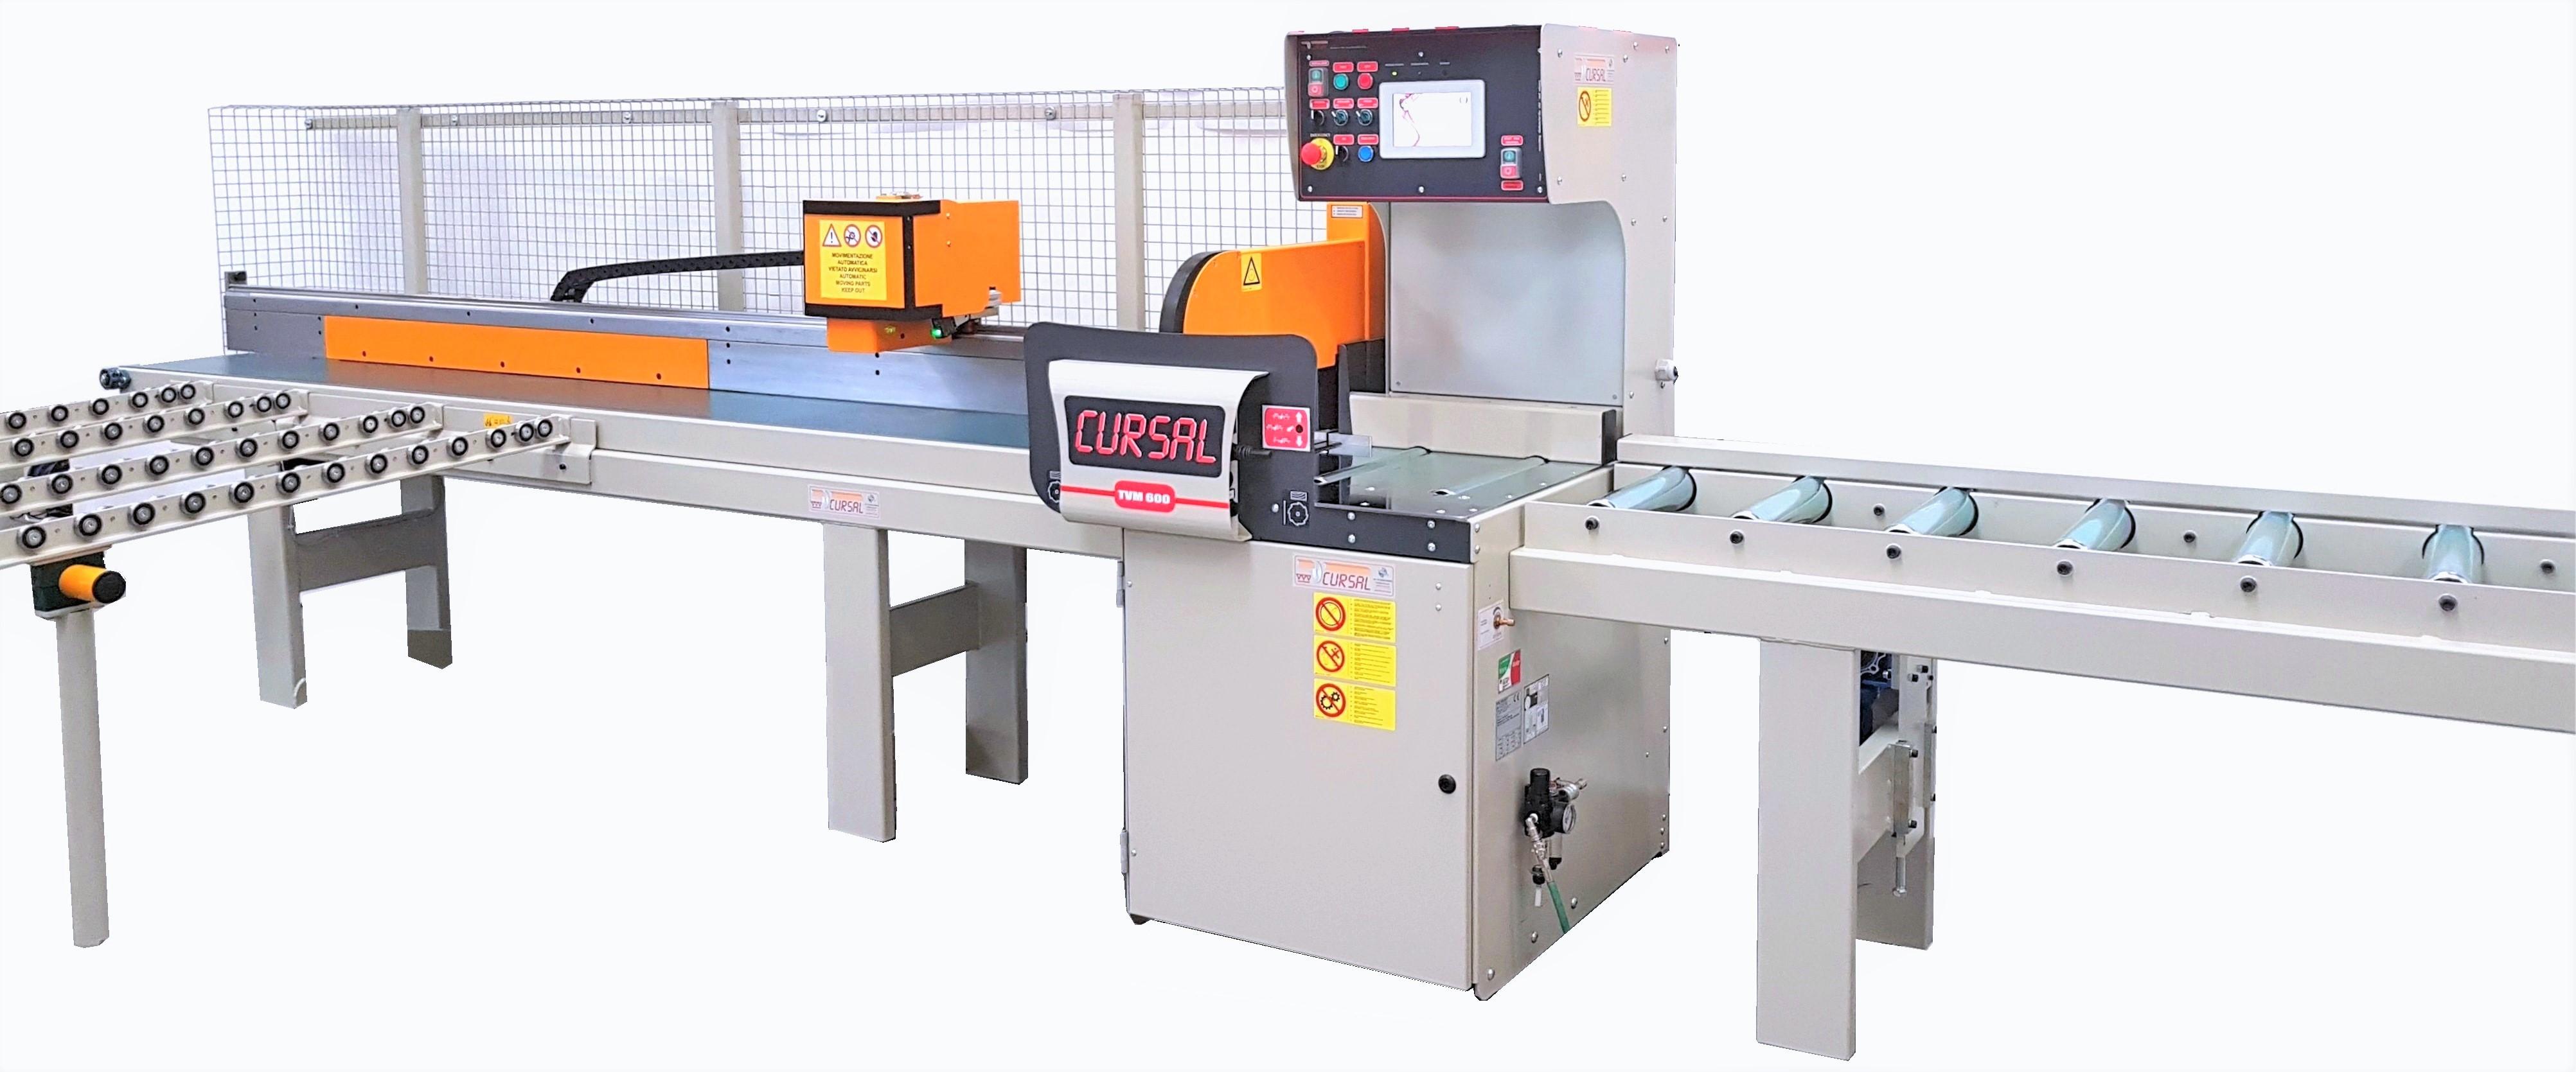 rapid-semi-automatic-saws-tvm-600-09